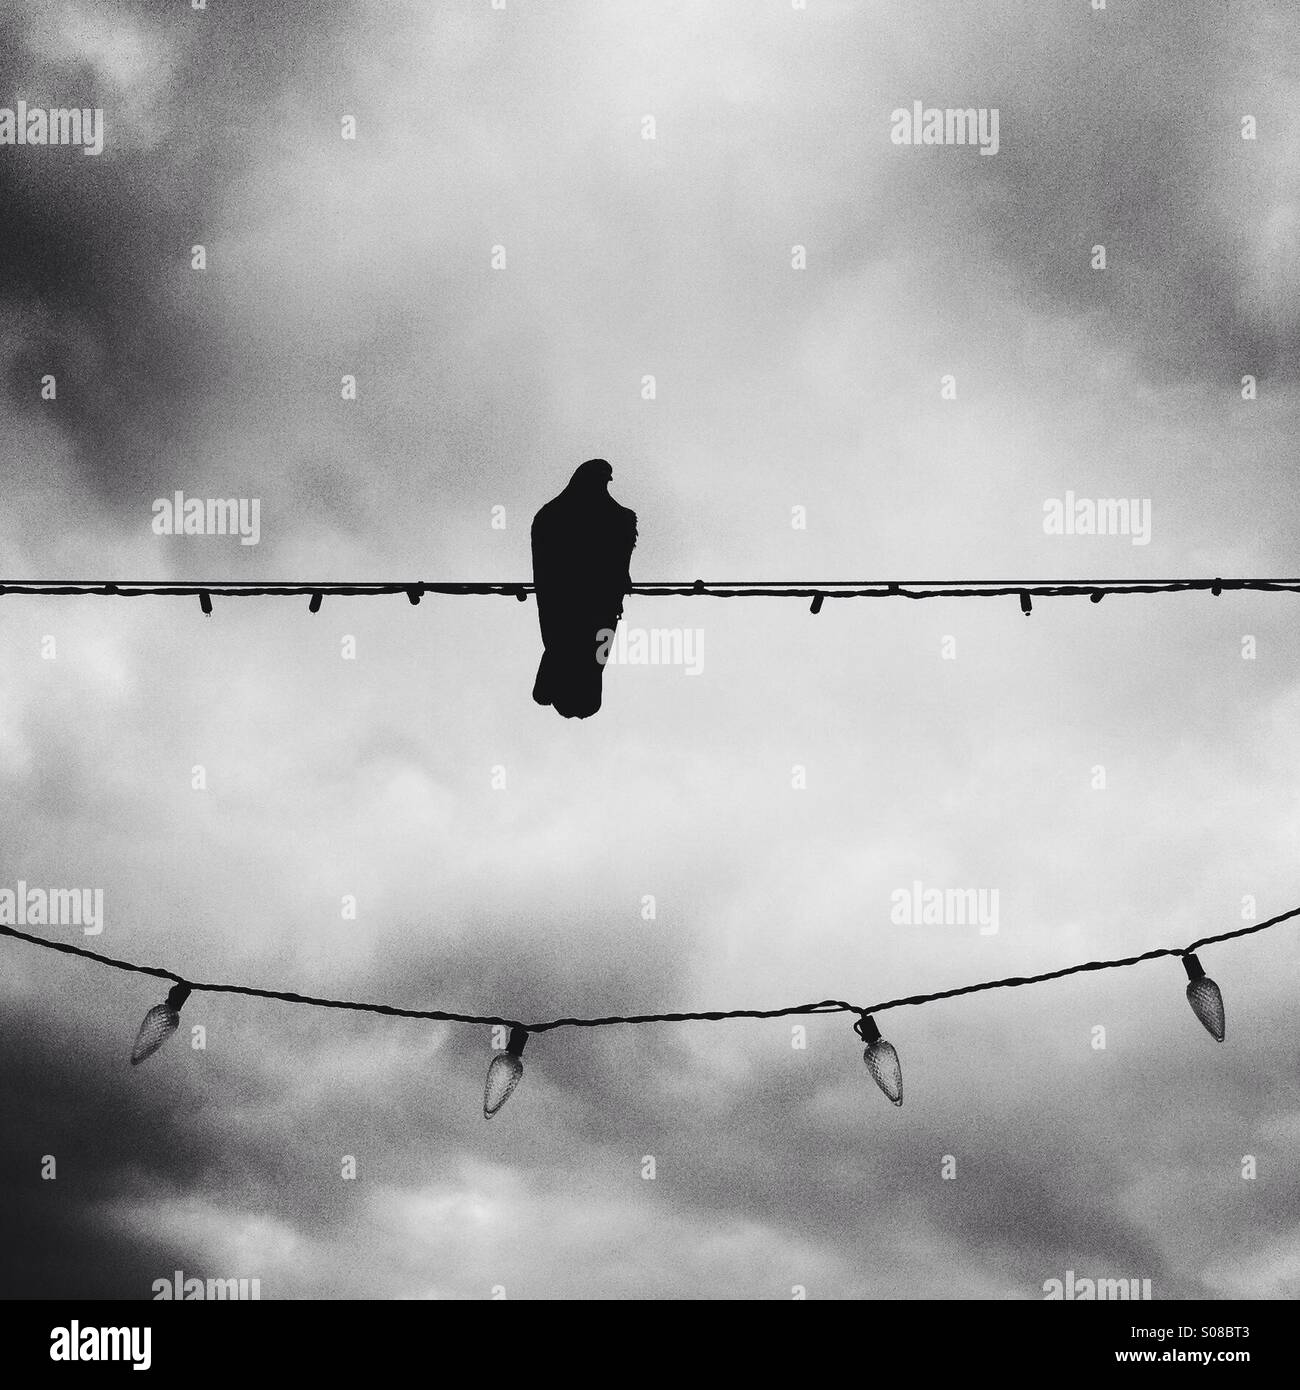 Black And White Pigeon Stockfotos & Black And White Pigeon Bilder ...